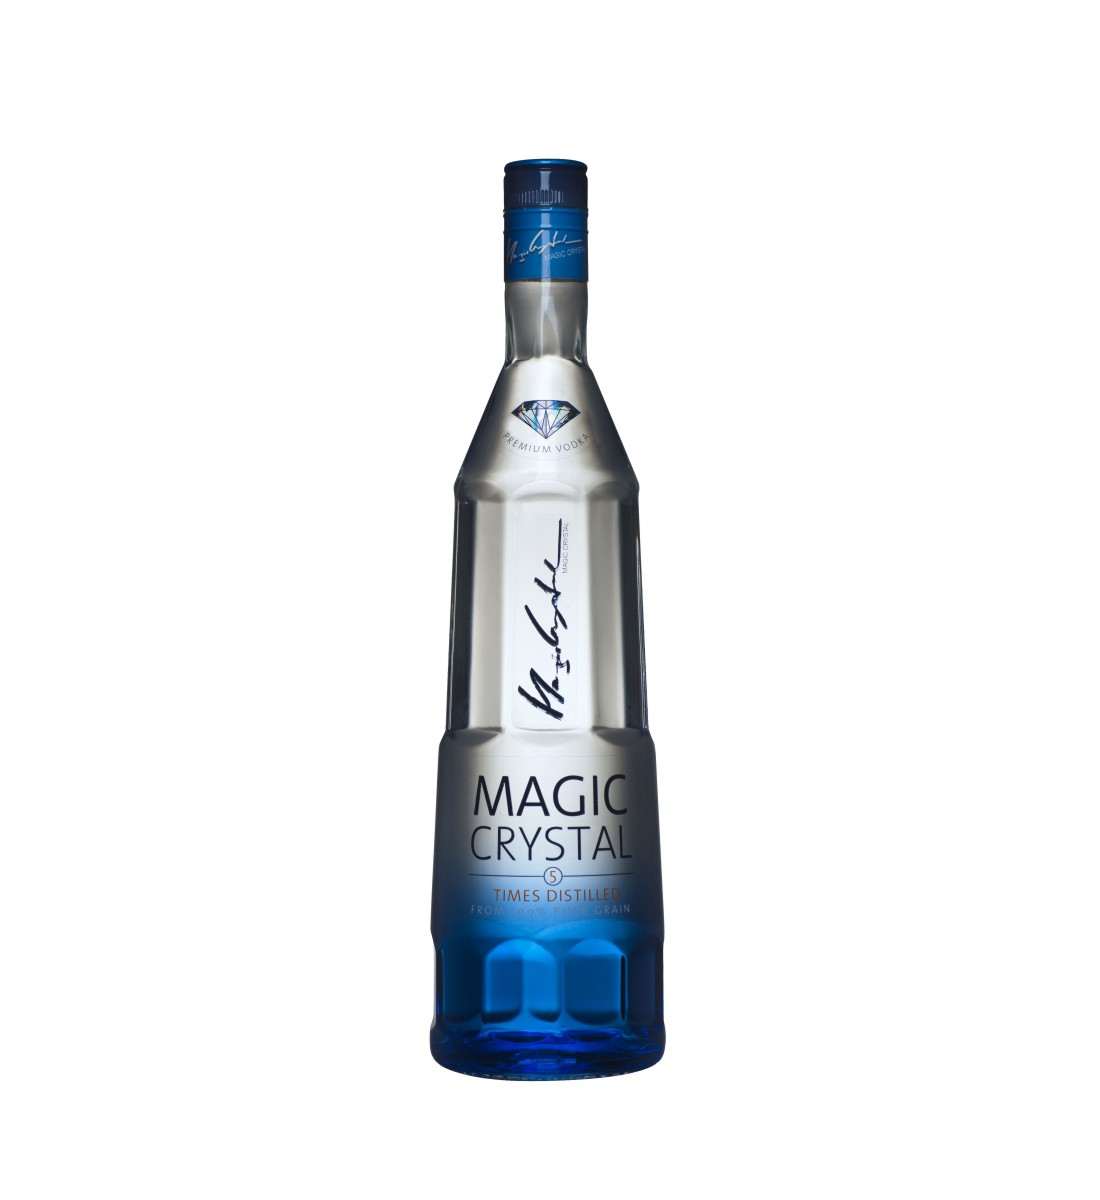 Magic Crystal Premium Vodka 0.7L